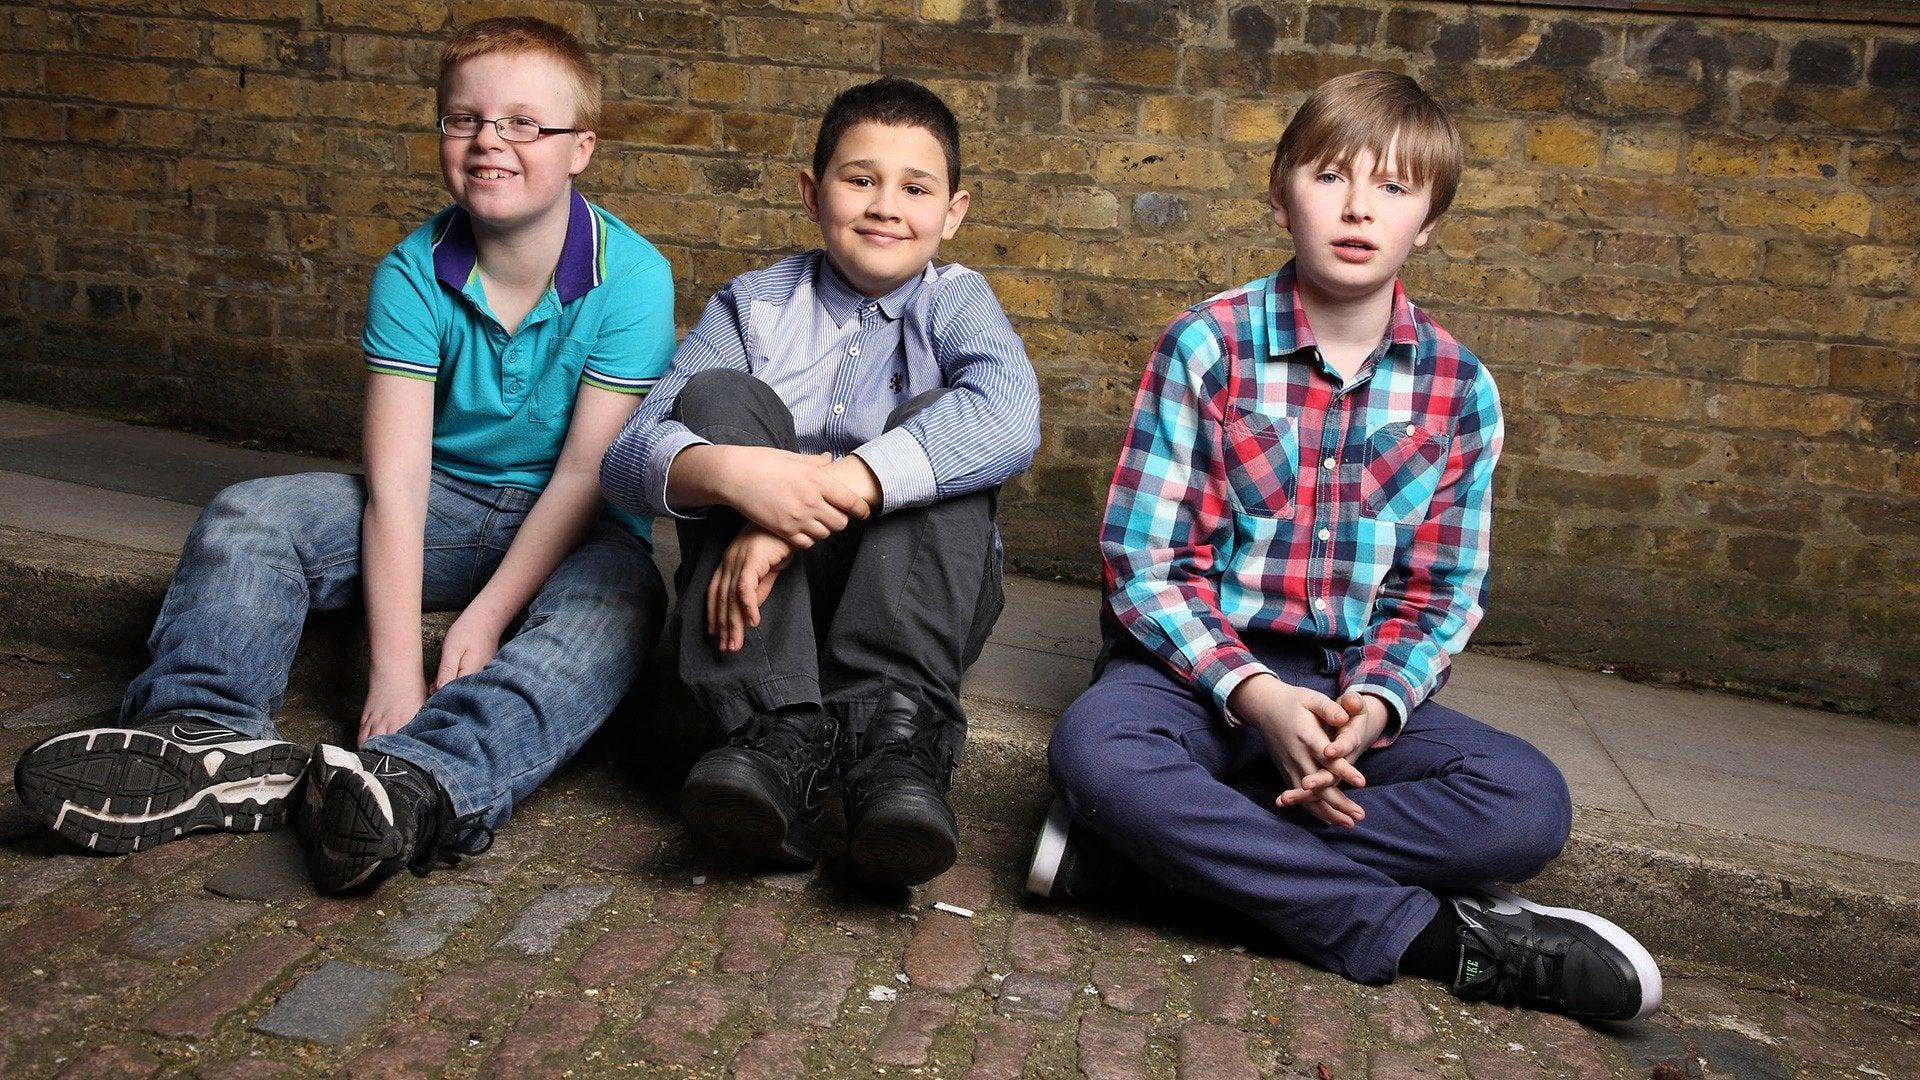 Kids With Tourettes